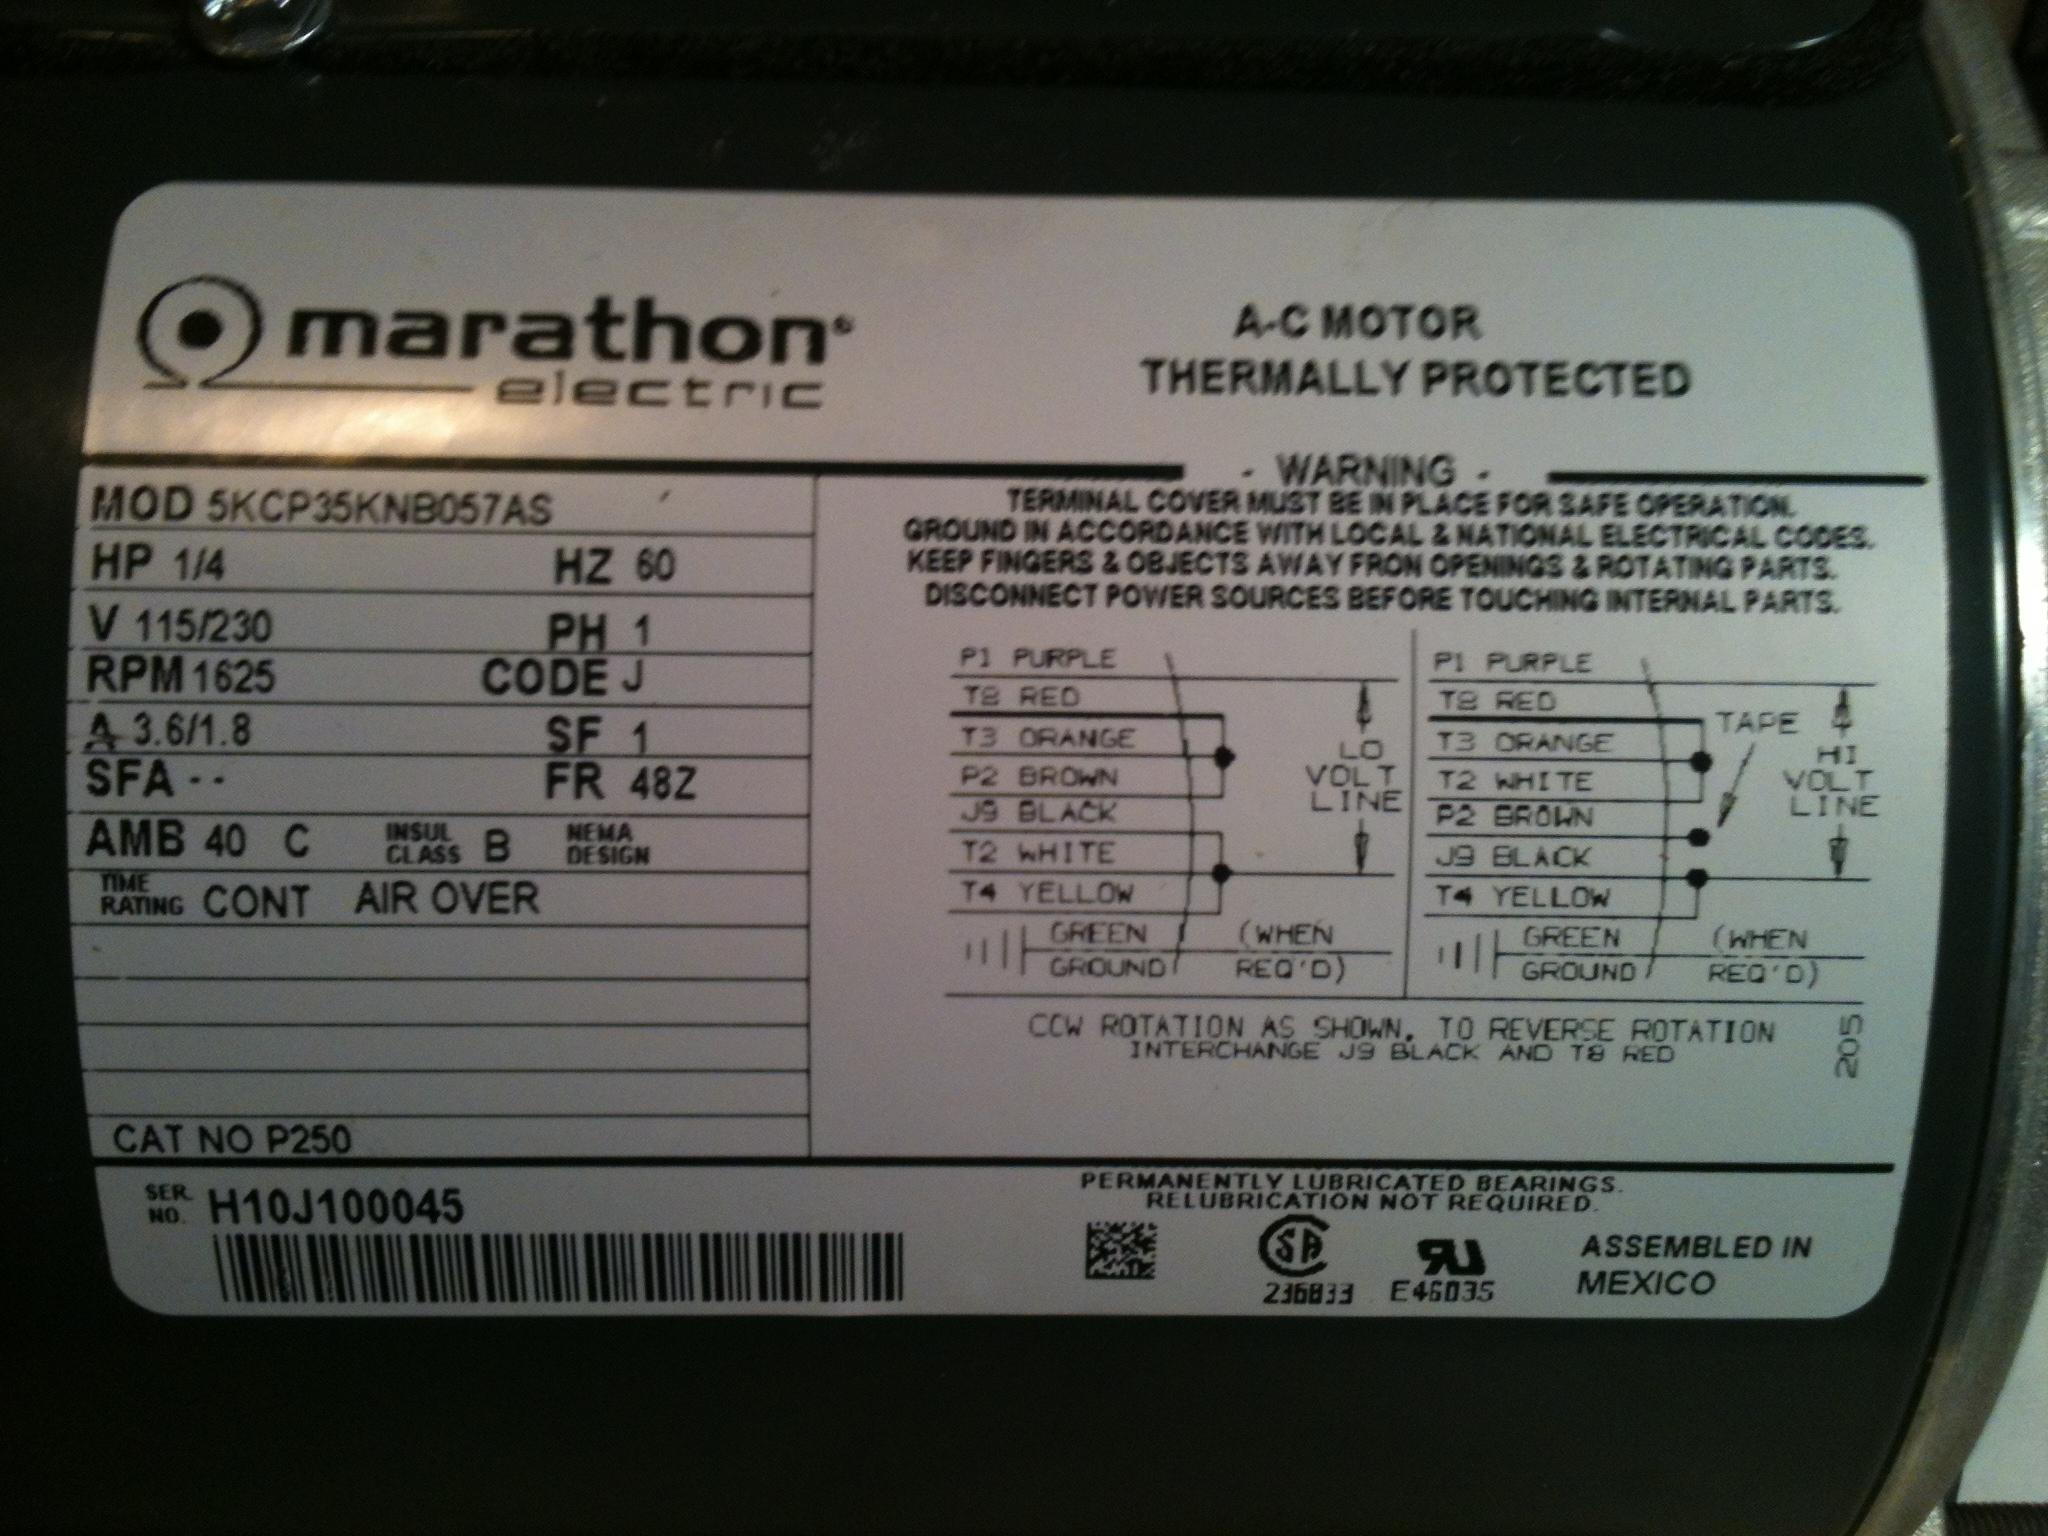 Marathon Electric Motor 1 Hp Wiring Schematic 110. Marathon Electric Motor Wiring Diagram Problems Motorssiteorg On 110volt. GM. Marathon Electric Motor Wiringmodel5kh36mna987b At Scoala.co